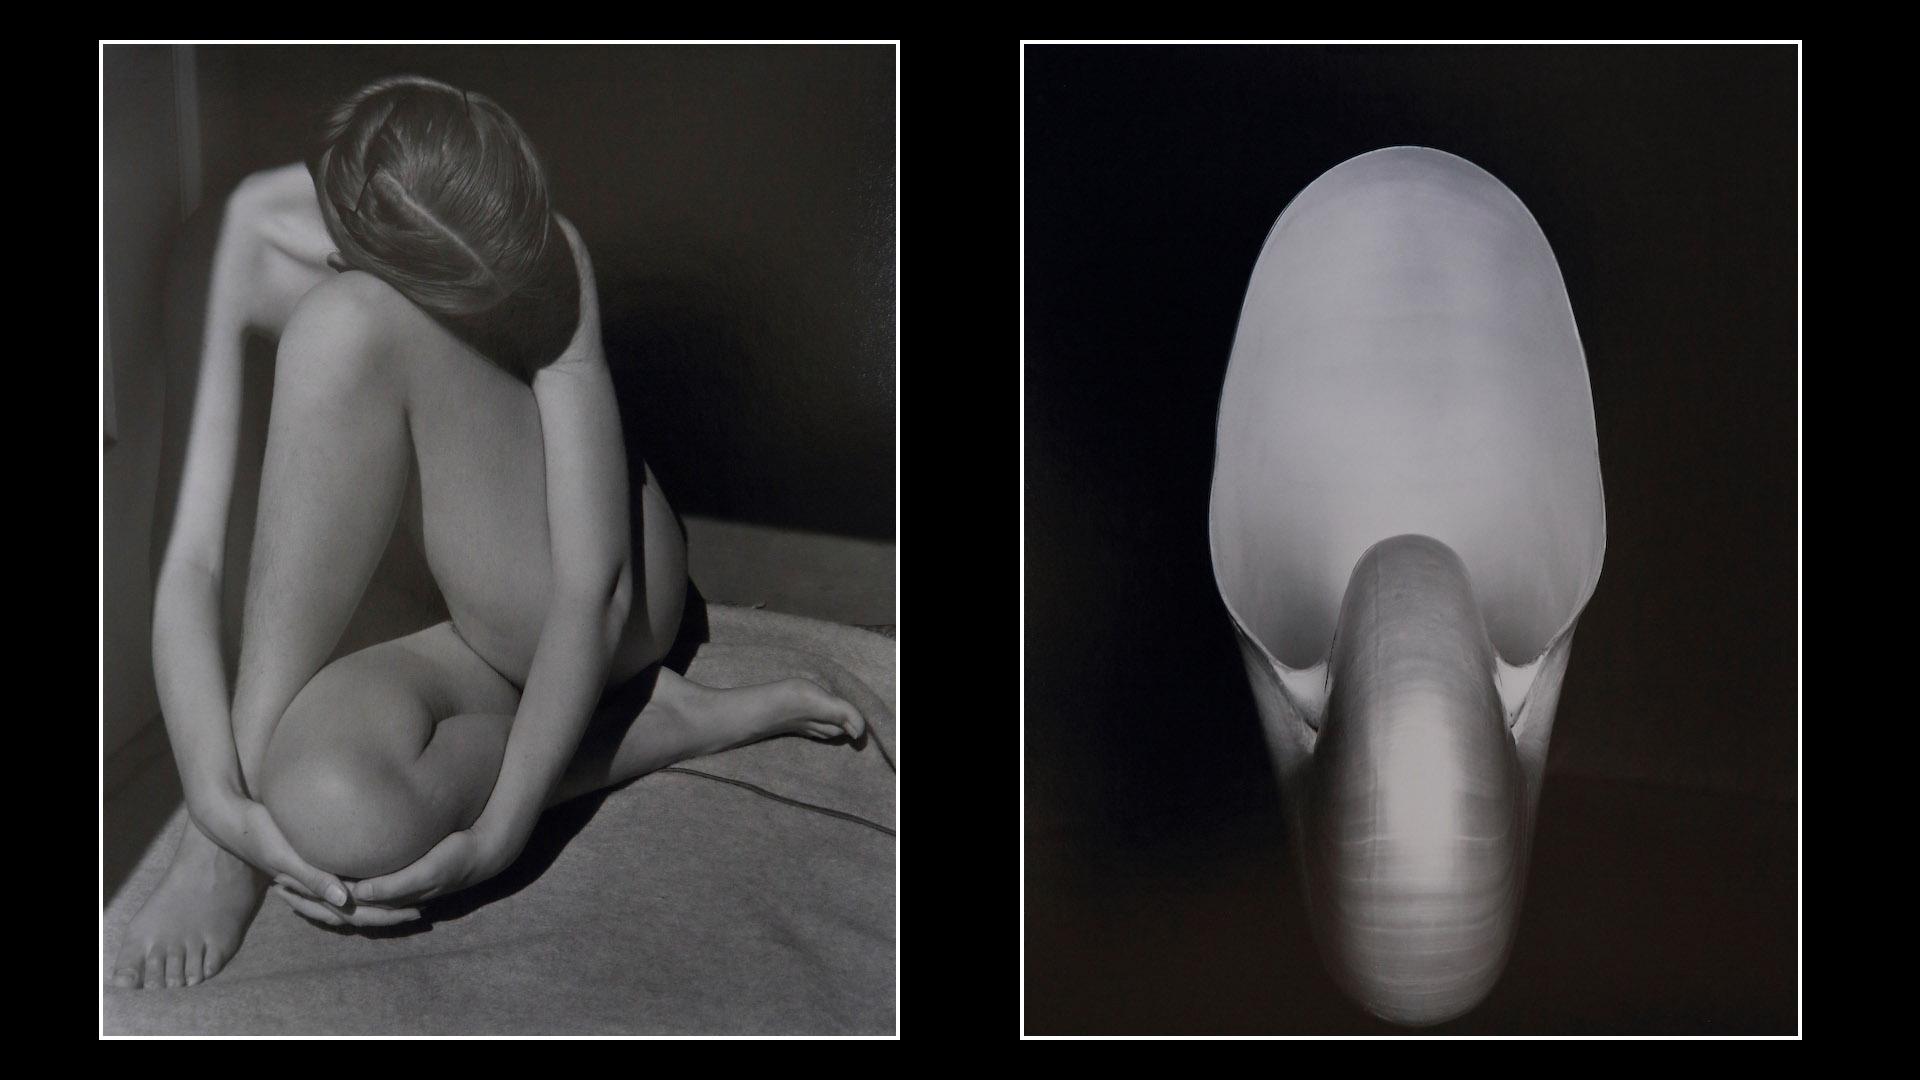 Edward Weston: Nude 1935 and Shell 1927